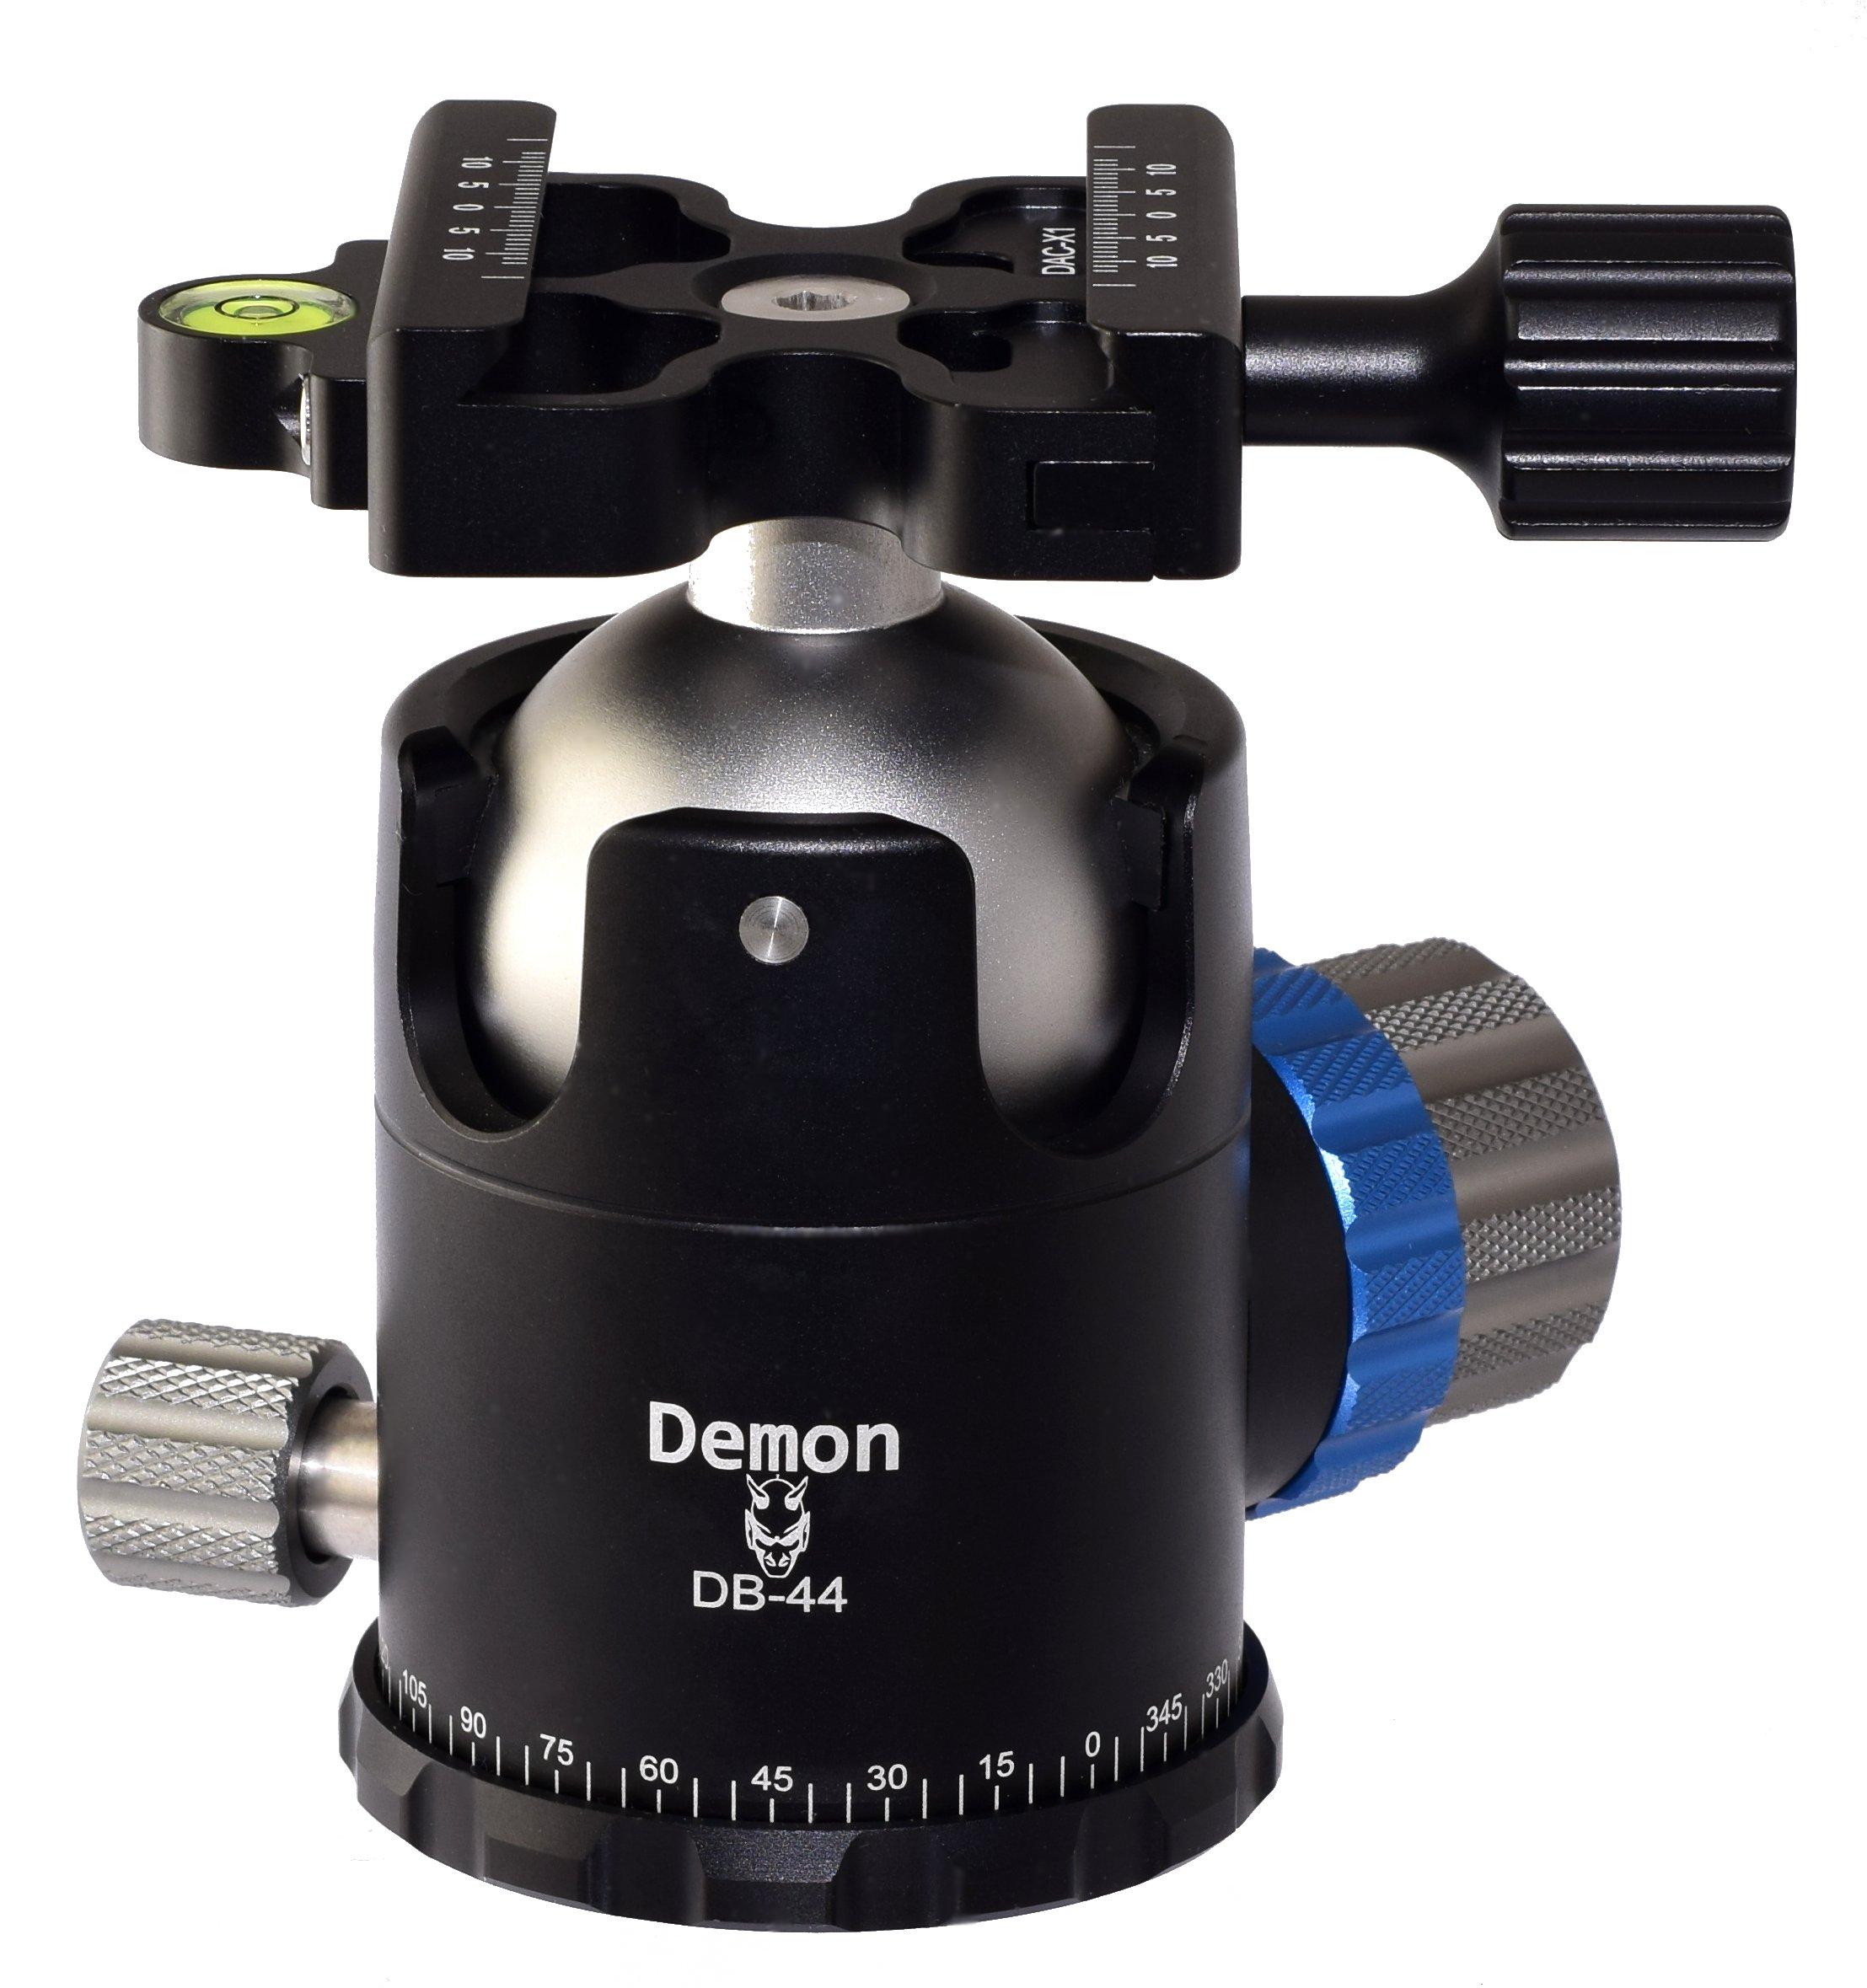 Desmond Demon DB-44 44mm Tripod Ball Head Arca/RRS Compatible w Pan Lock & DAC-X1 Clamp by Desmond